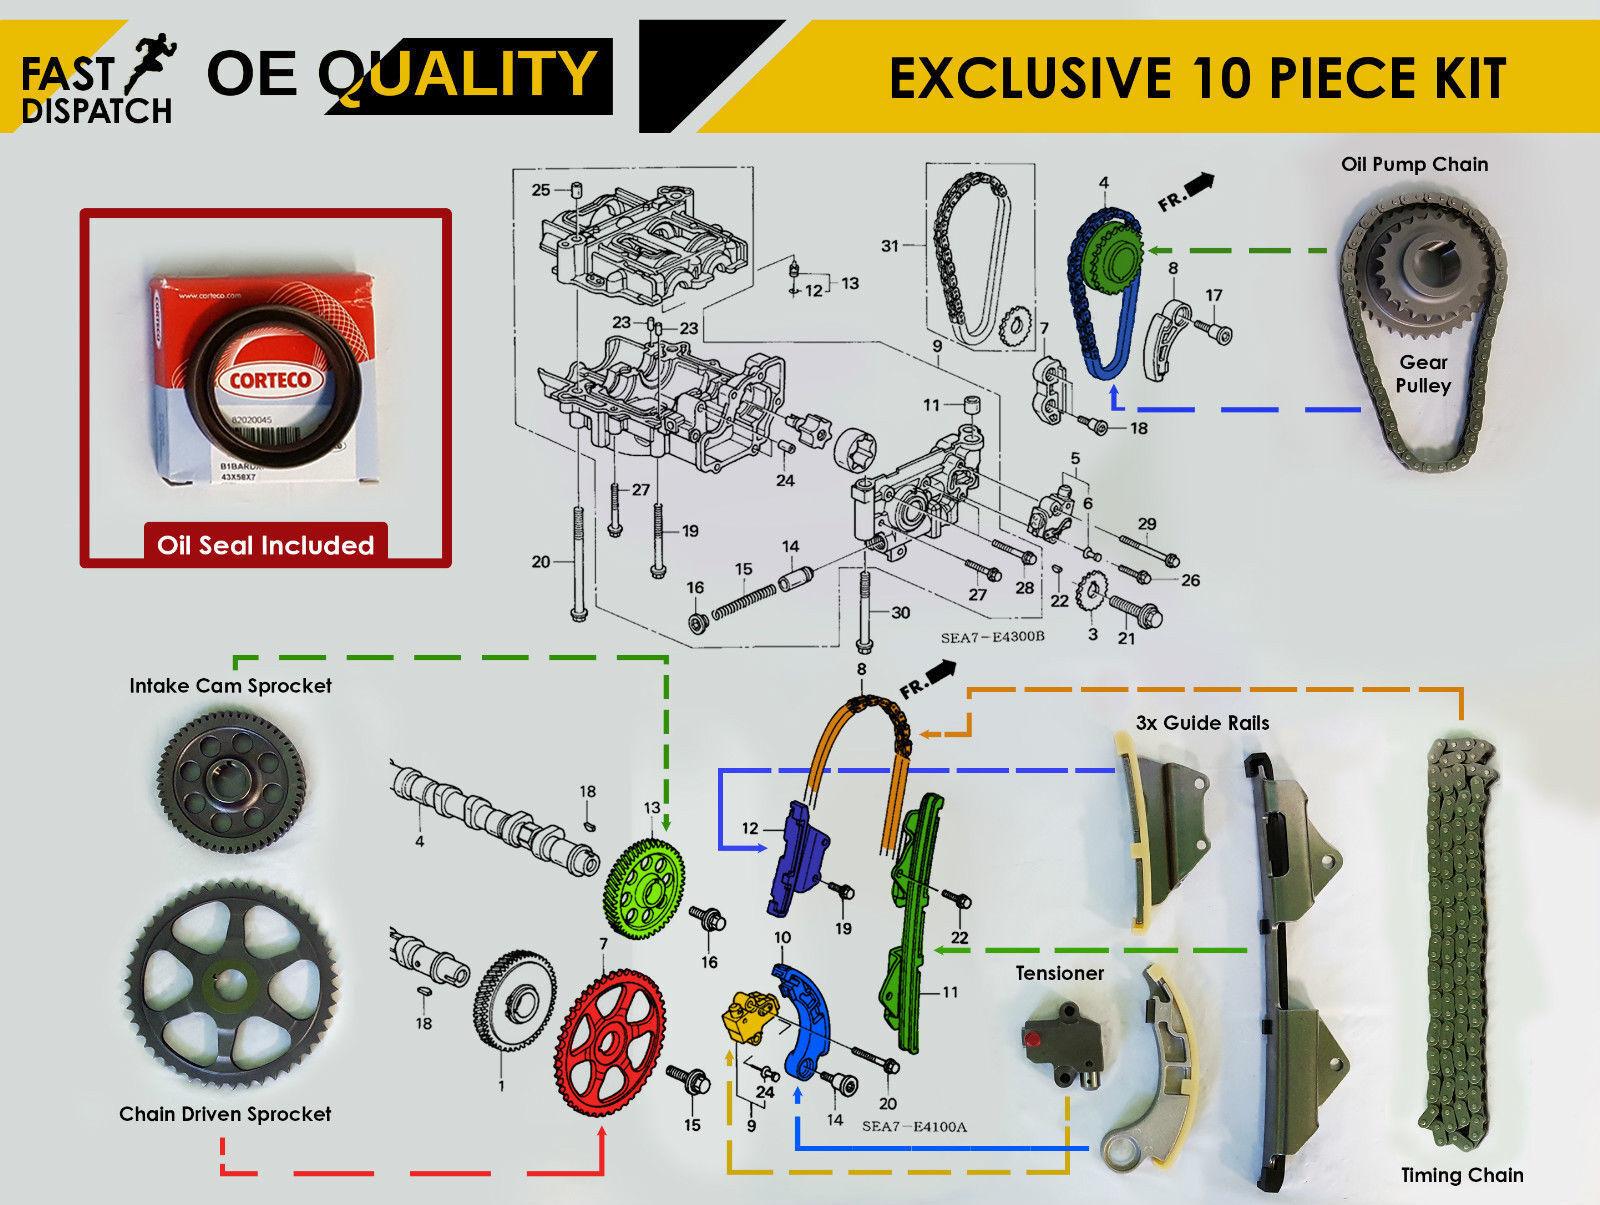 For Honda 22 Ctdi N22 N22a1 N22a2 Timing Cam Chain Tensioner Audi A4 Engine Change Diagram Sprockets Pump Kit